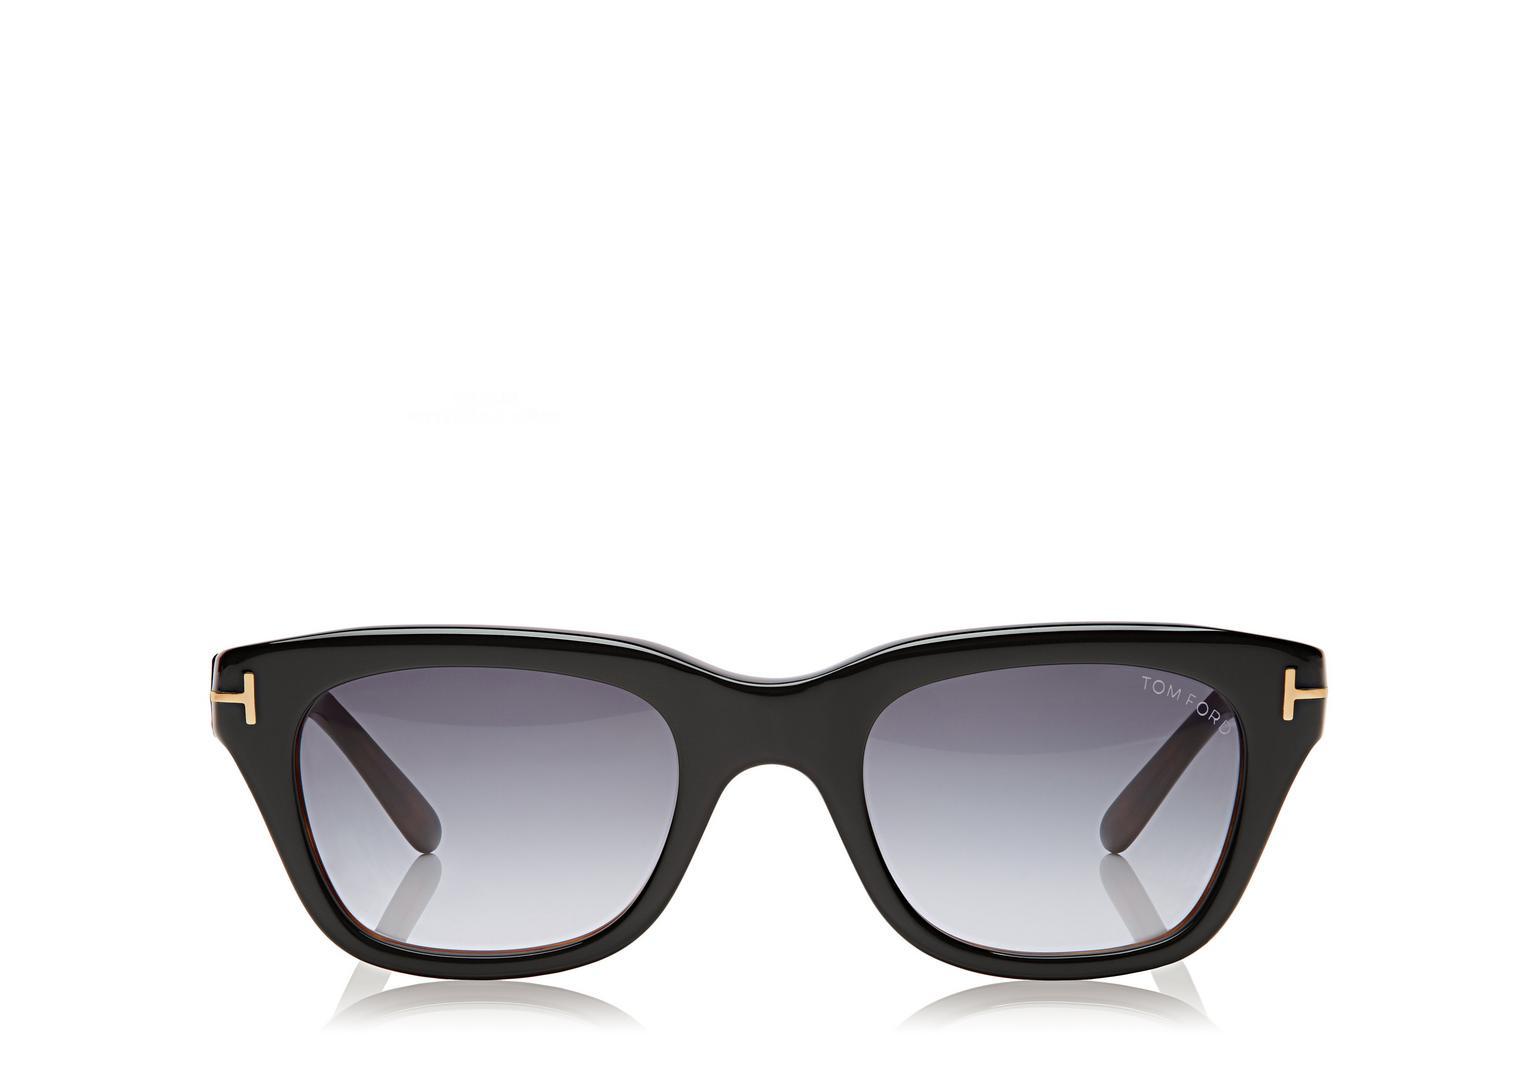 snowdon soft square sunglasses tom ford. Black Bedroom Furniture Sets. Home Design Ideas